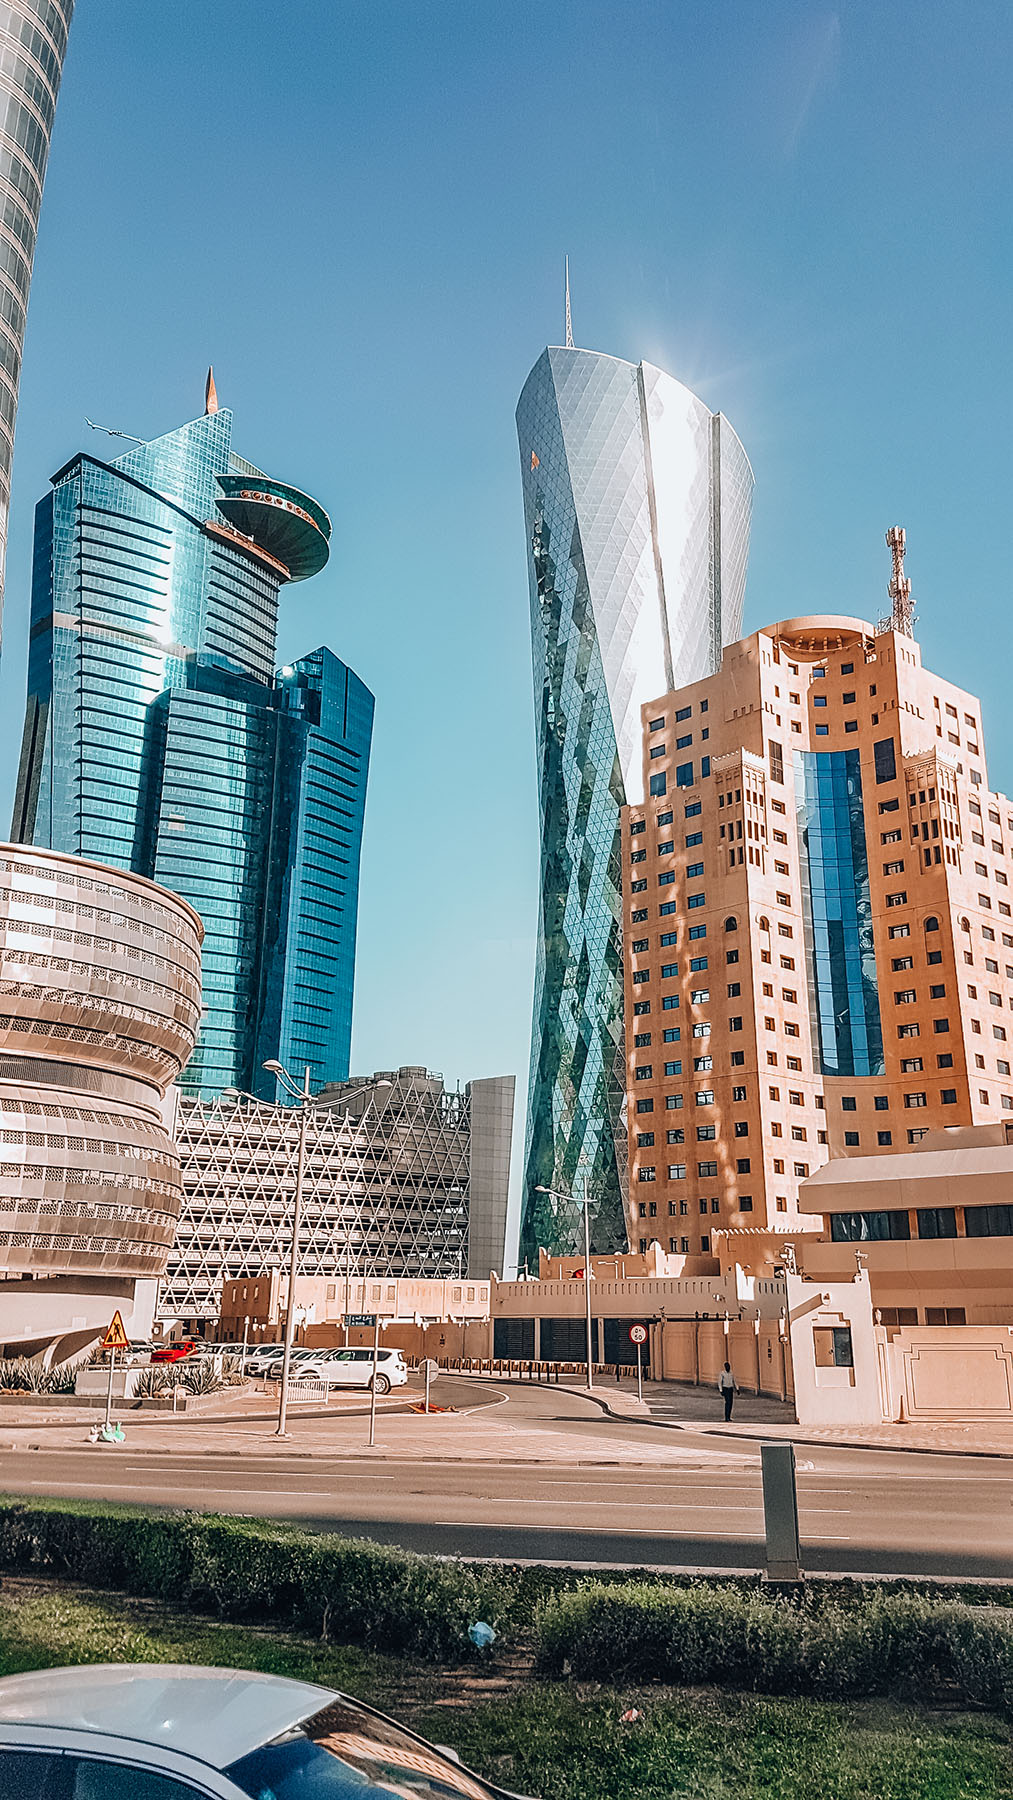 Orient Kreuzfahrt Doha Katar Ausflug Hochhäuser